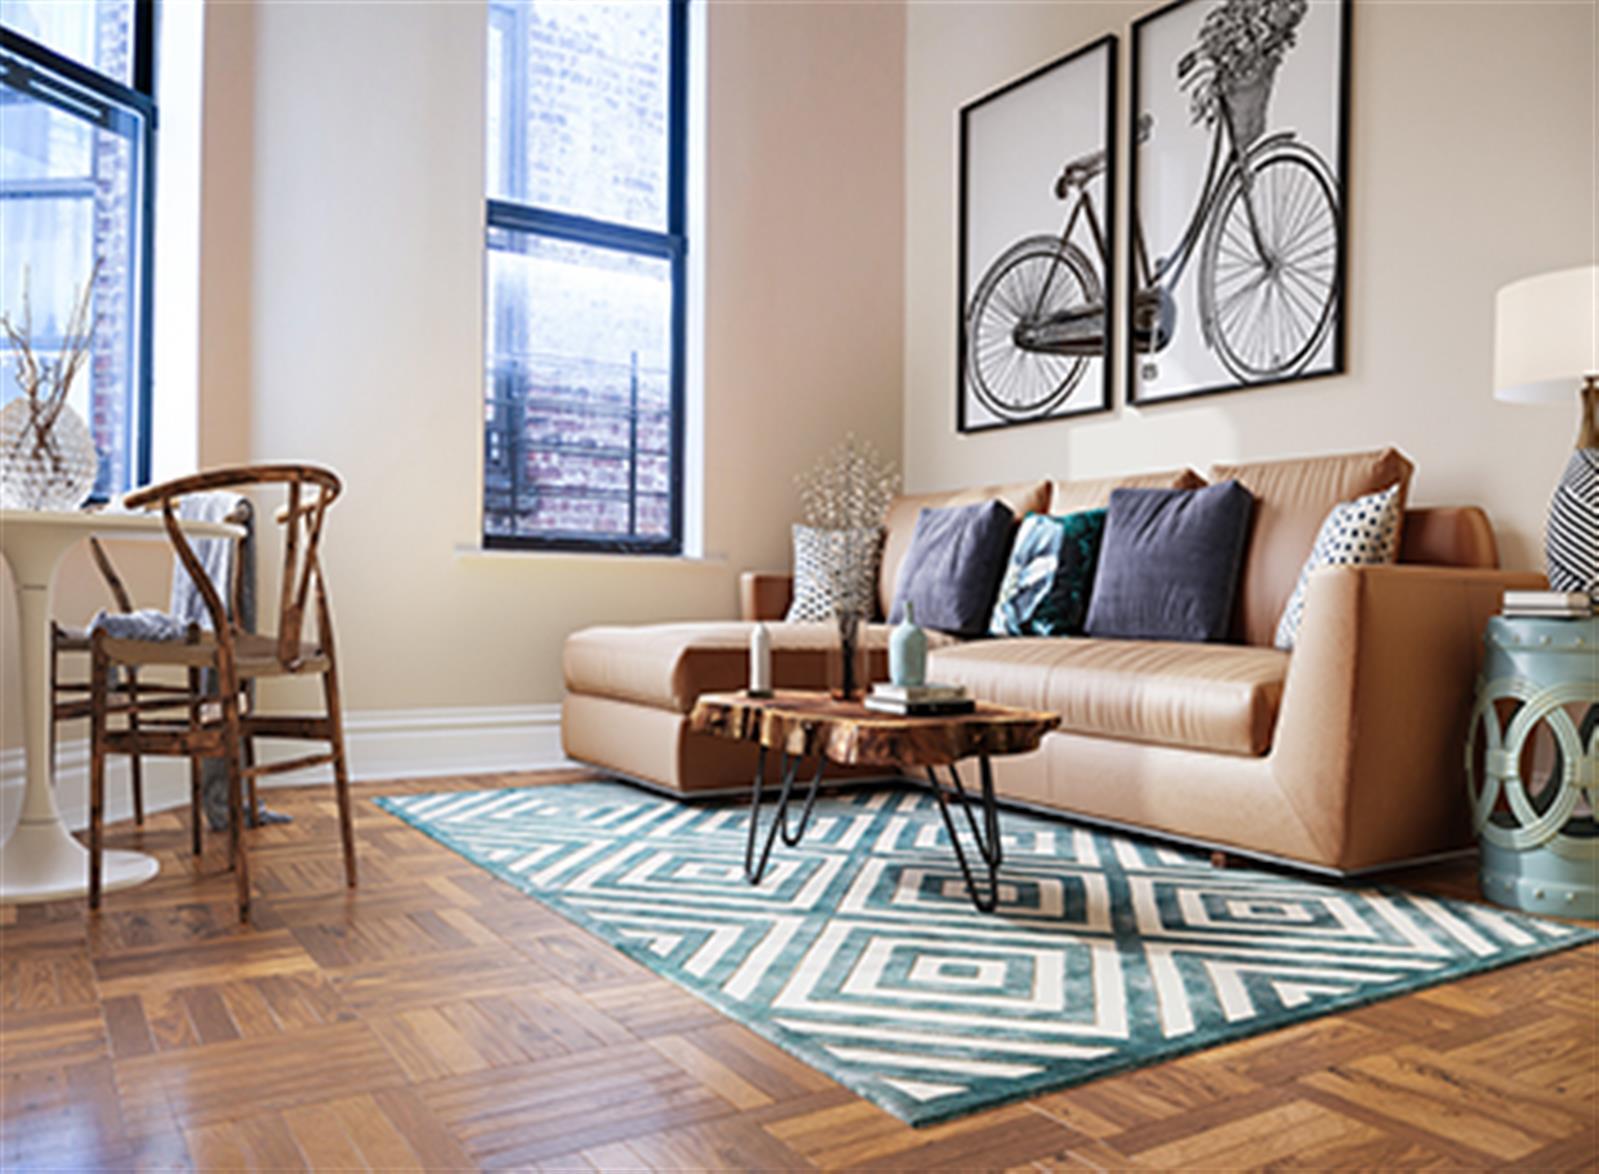 Two bedroom - Upper West Side